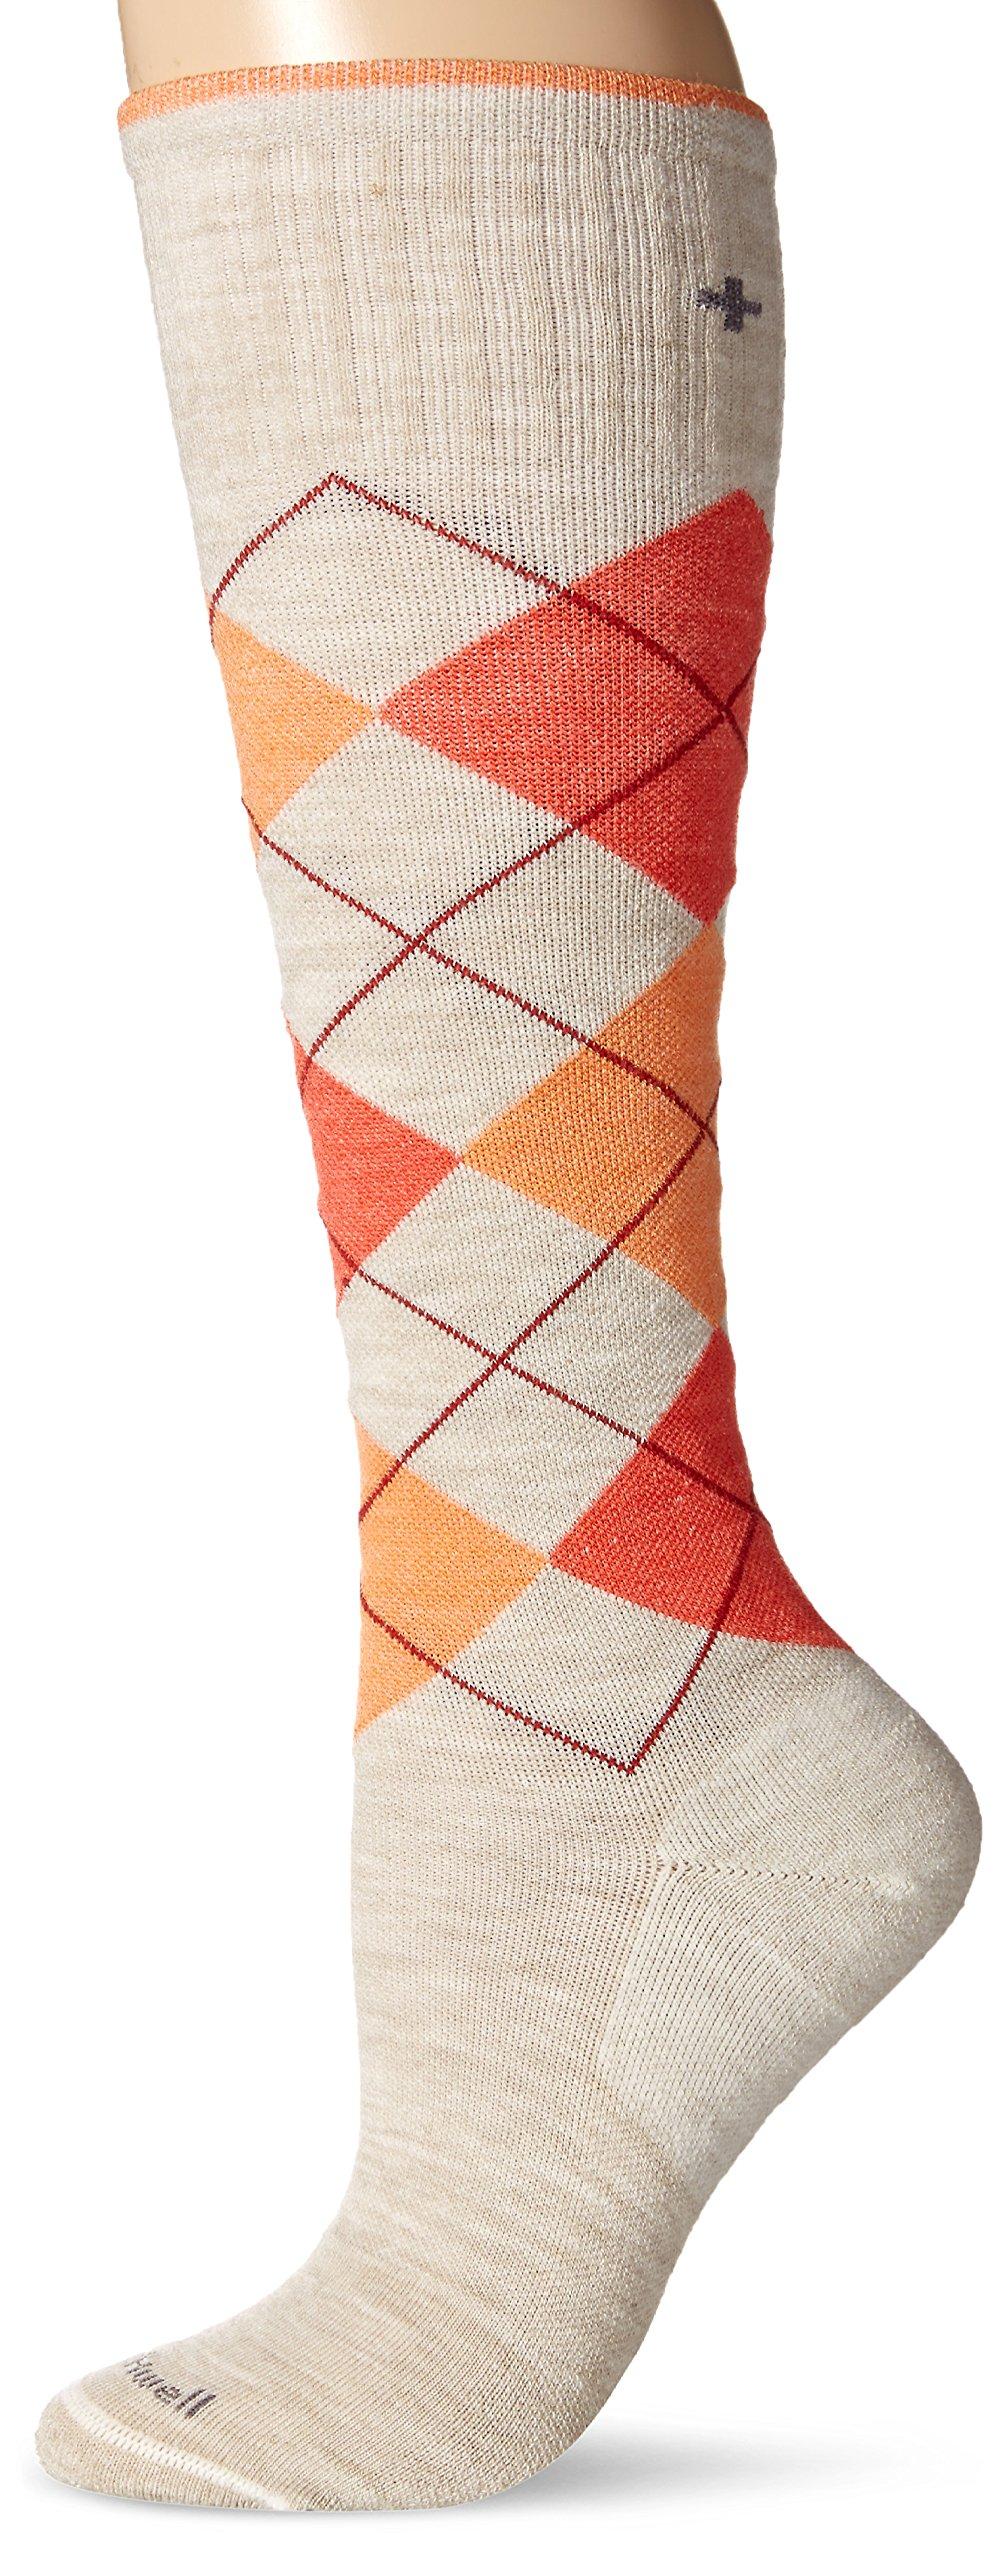 Sockwell Women's Argyle Graduated Compression Socks, Barley, Small/Medium